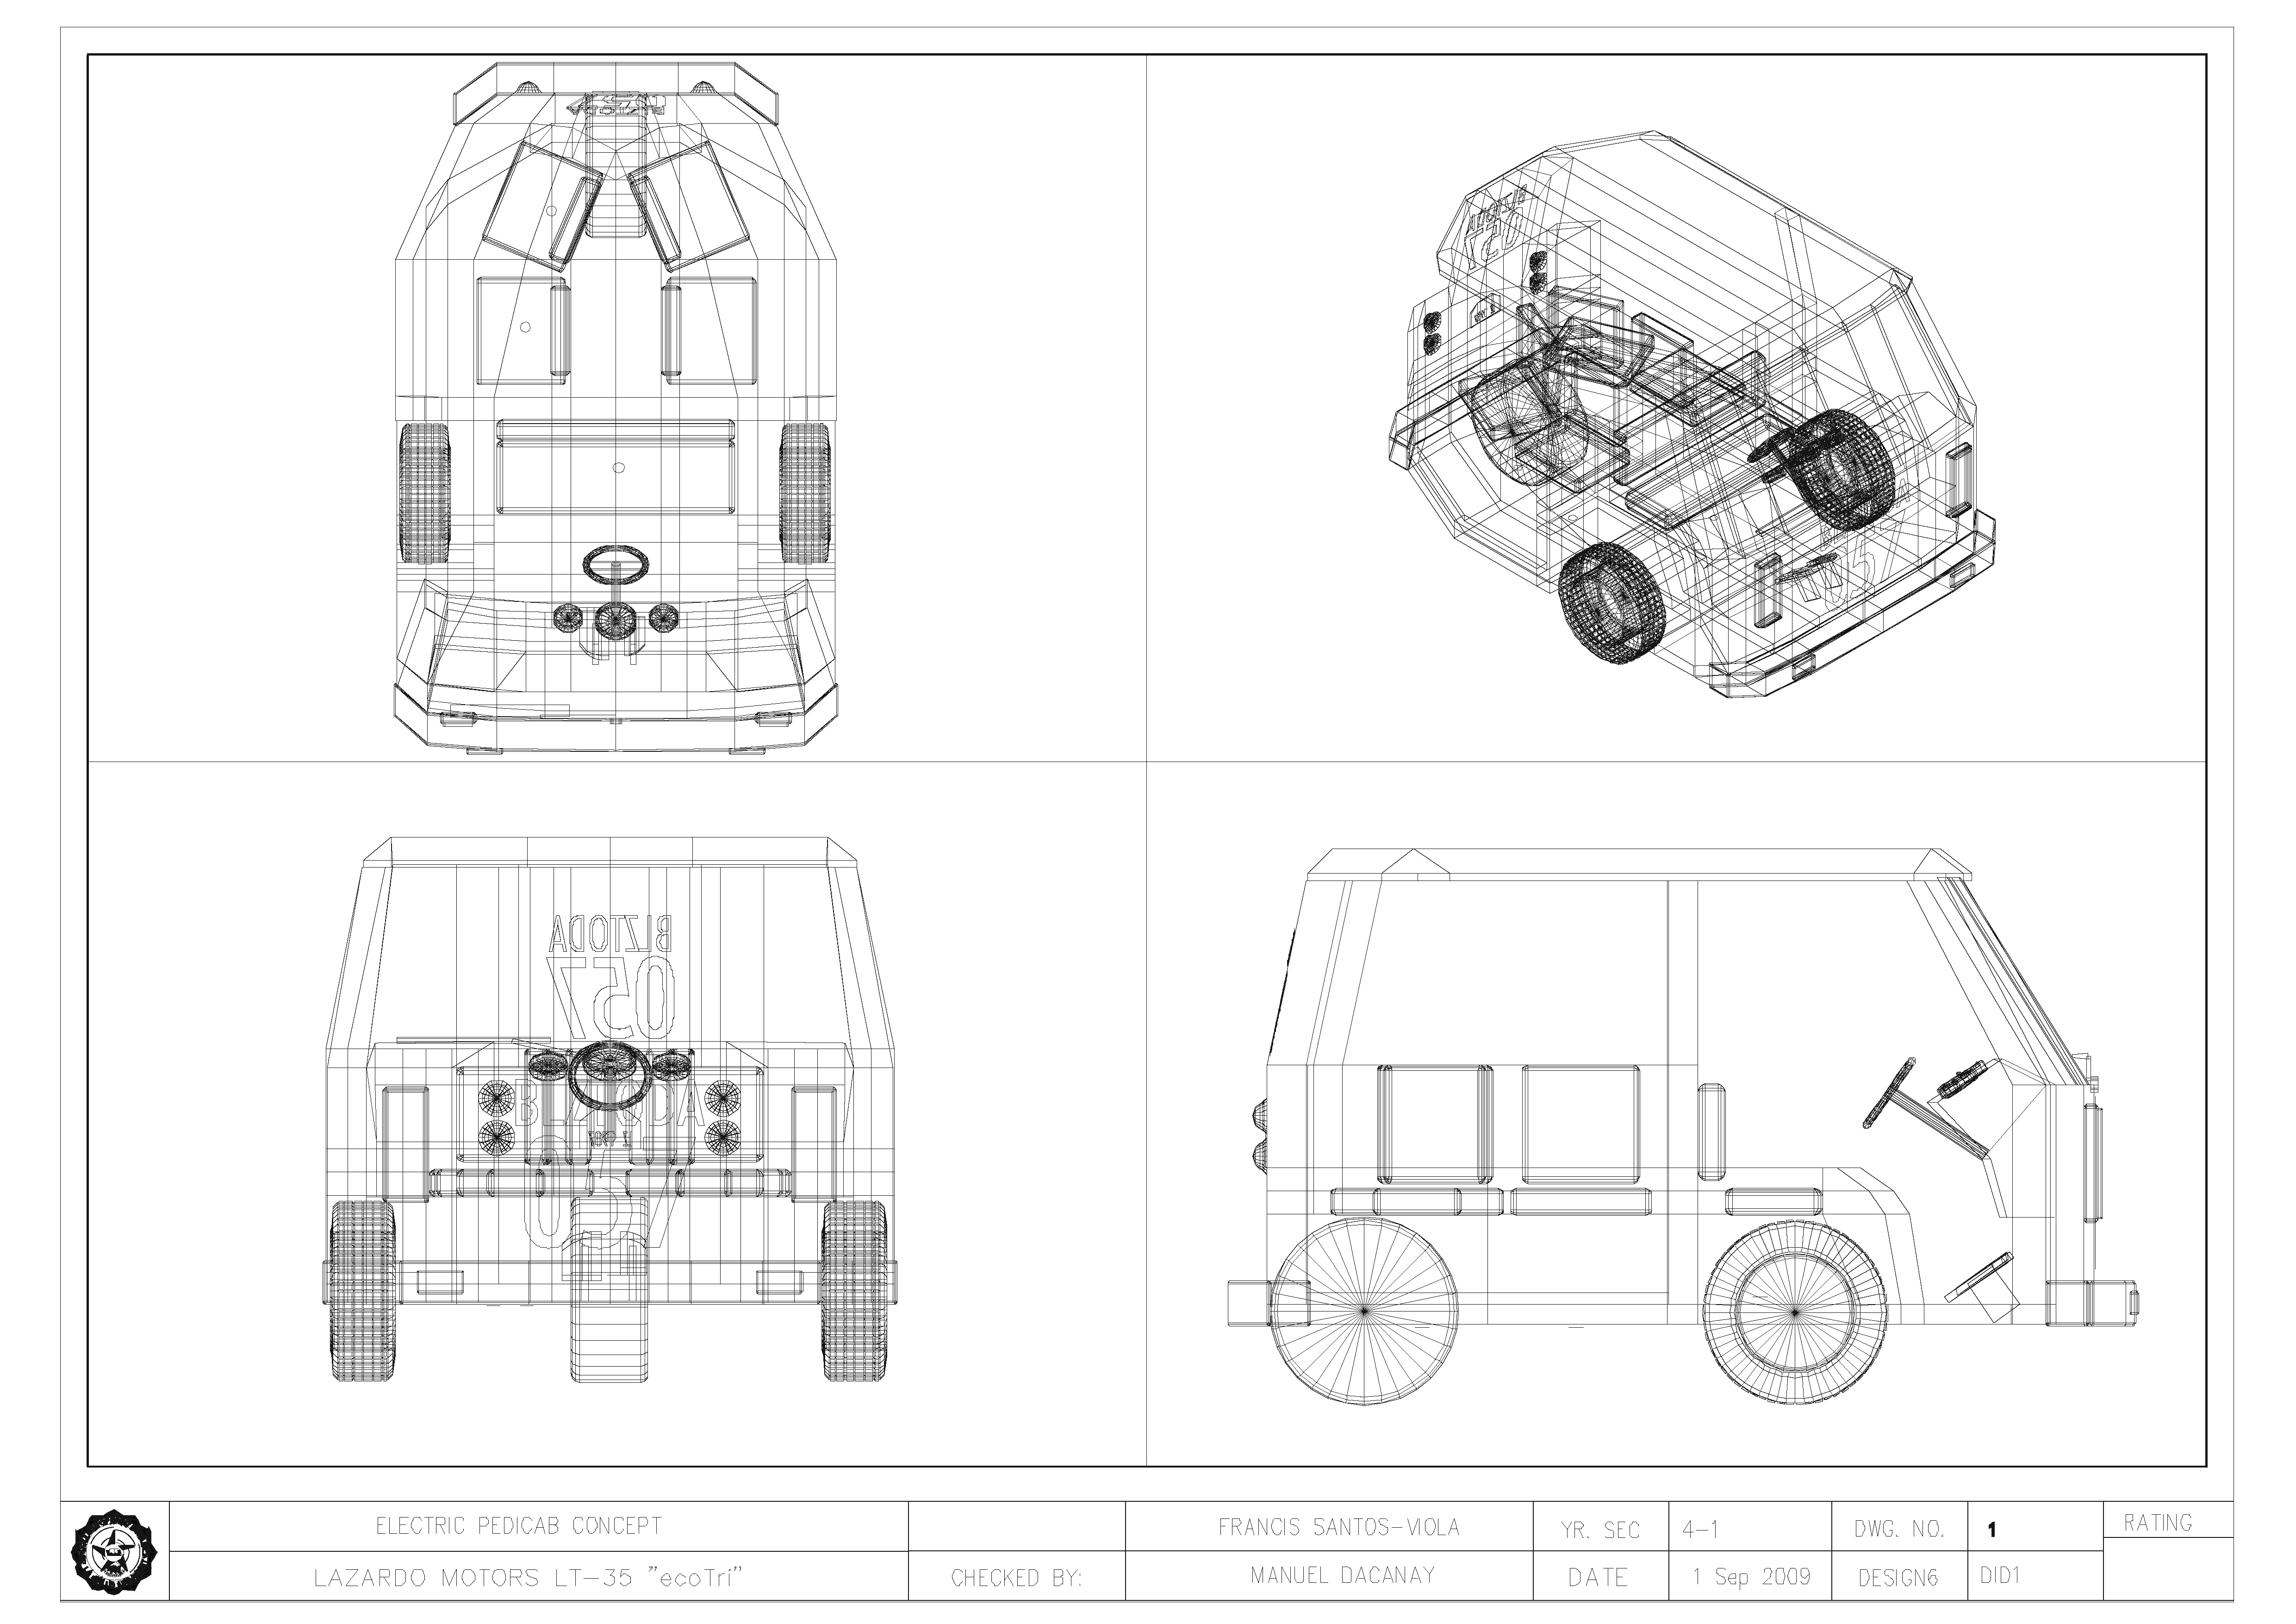 Lt 35 Electric Vehicle By Francis Santos Viola At Coroflot